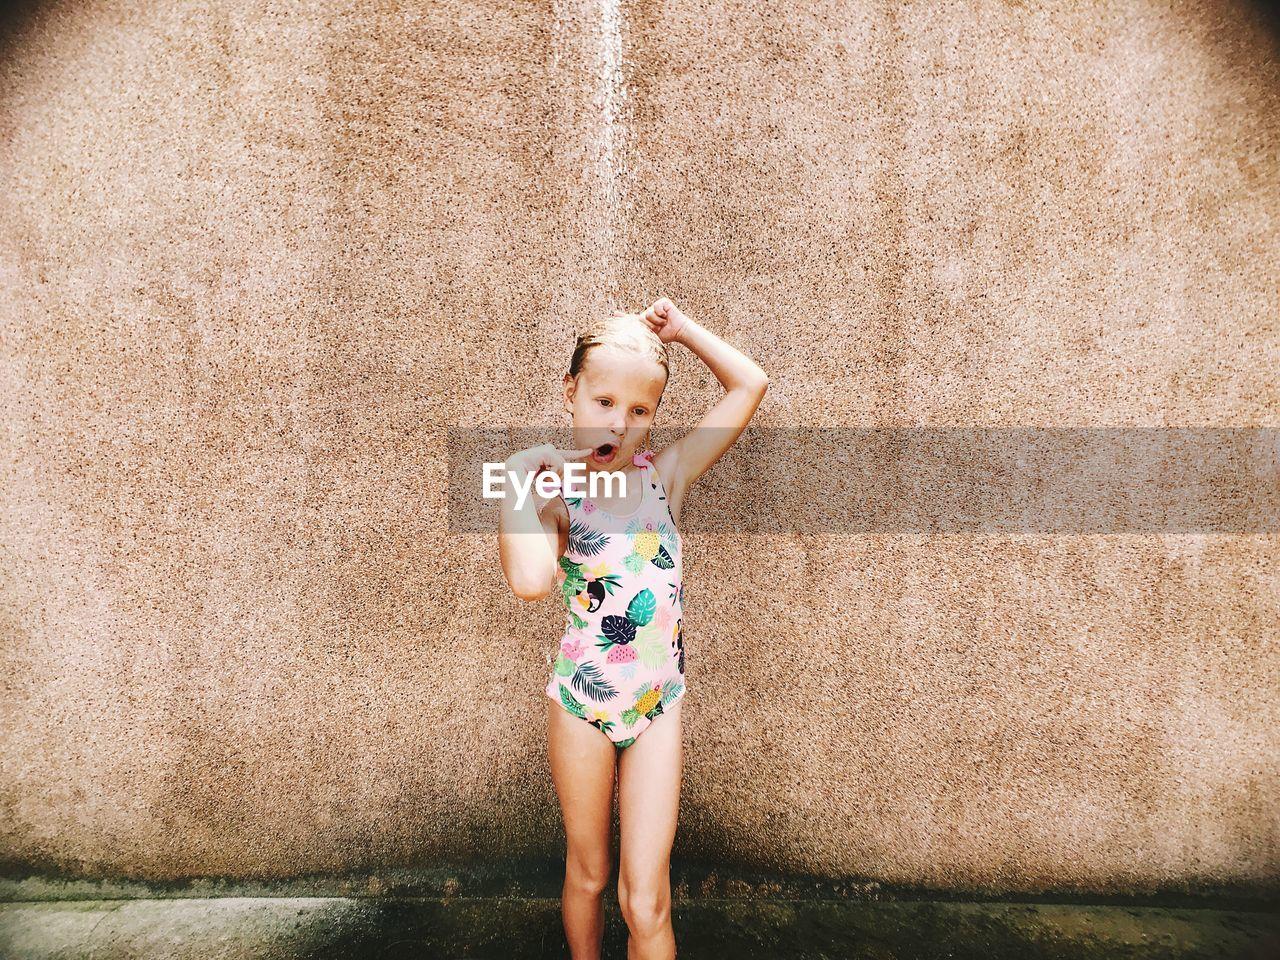 Girl wearing swimwear while taking shower against wall